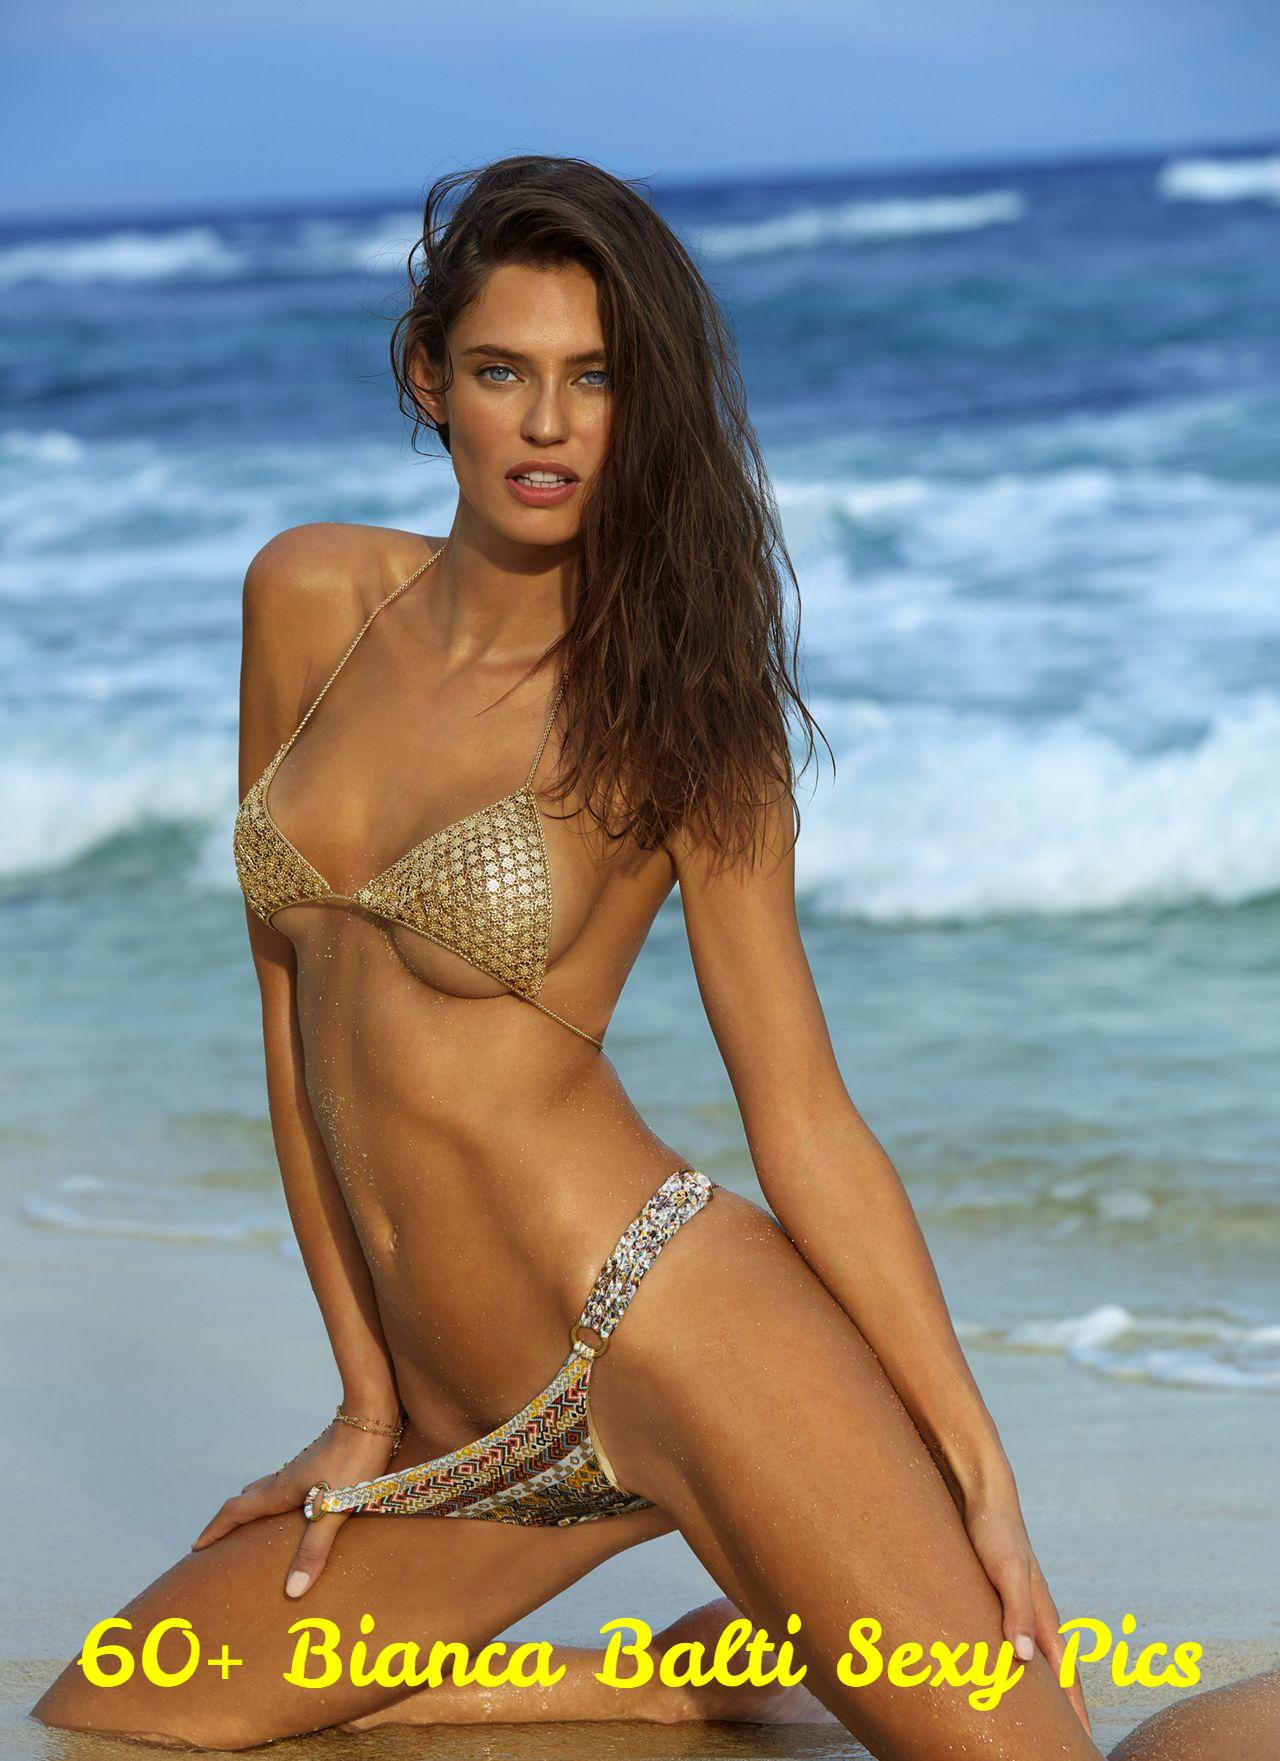 Bianca Balti sexy pics